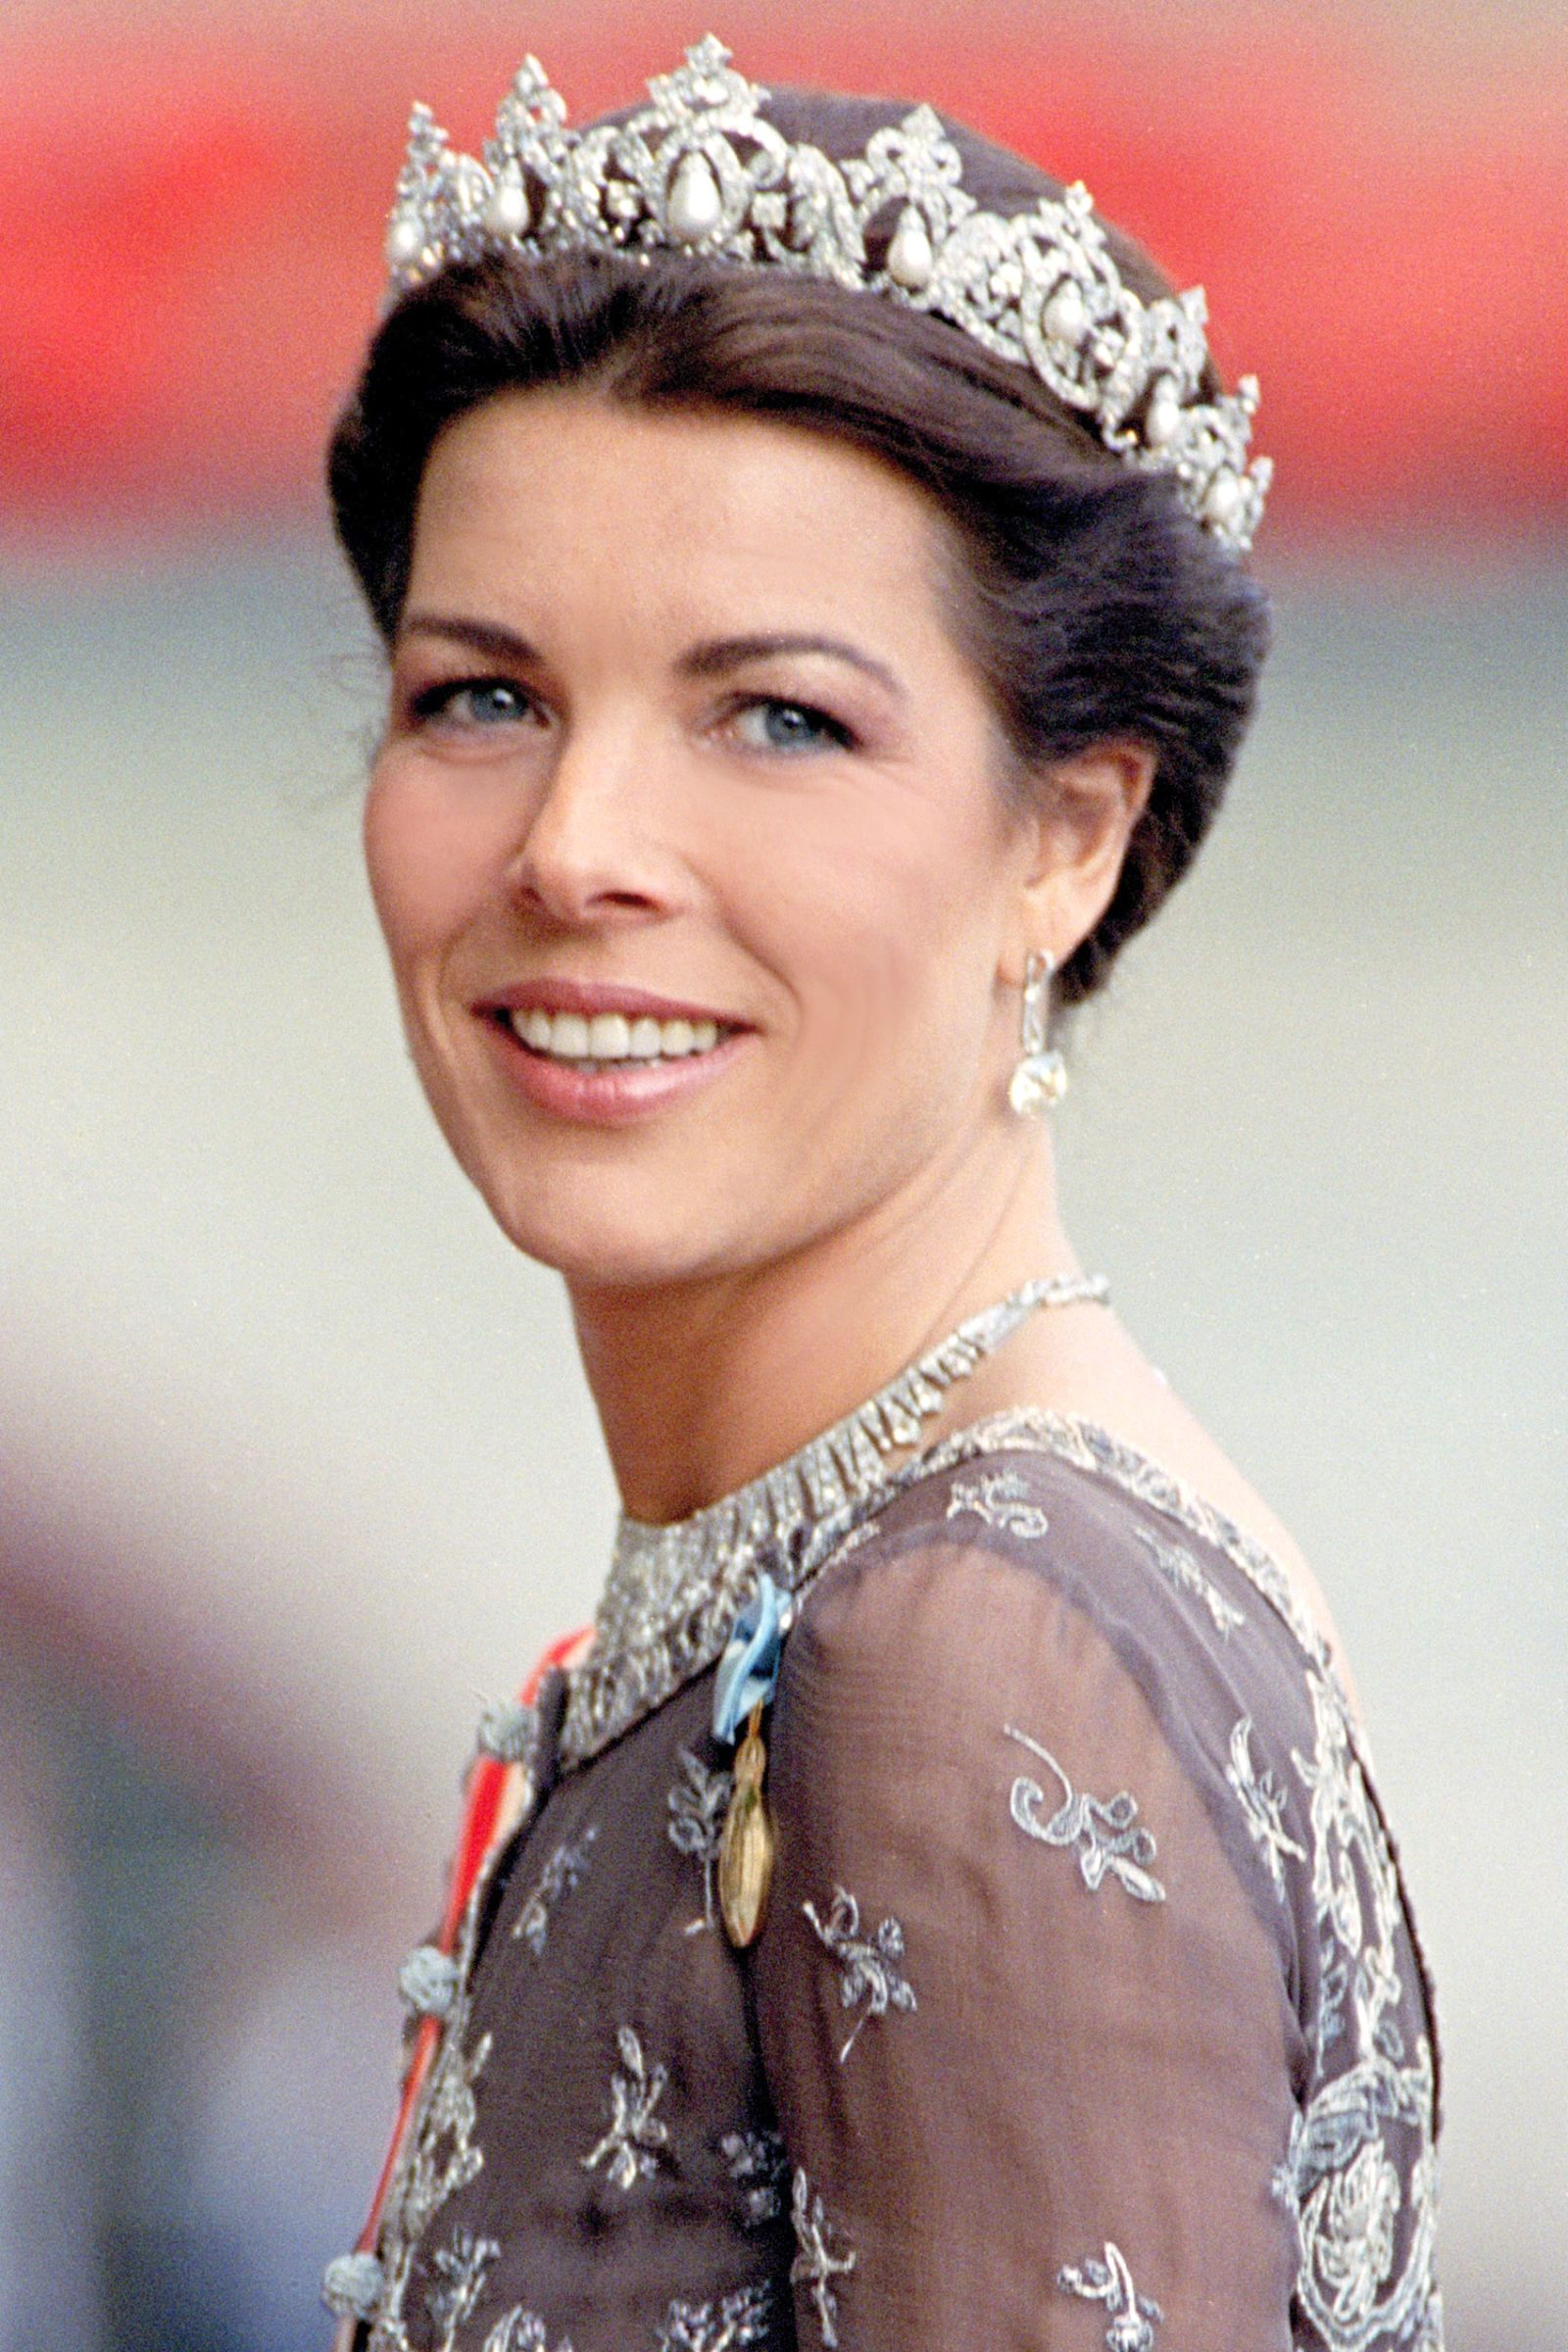 Prinsessa Caroline